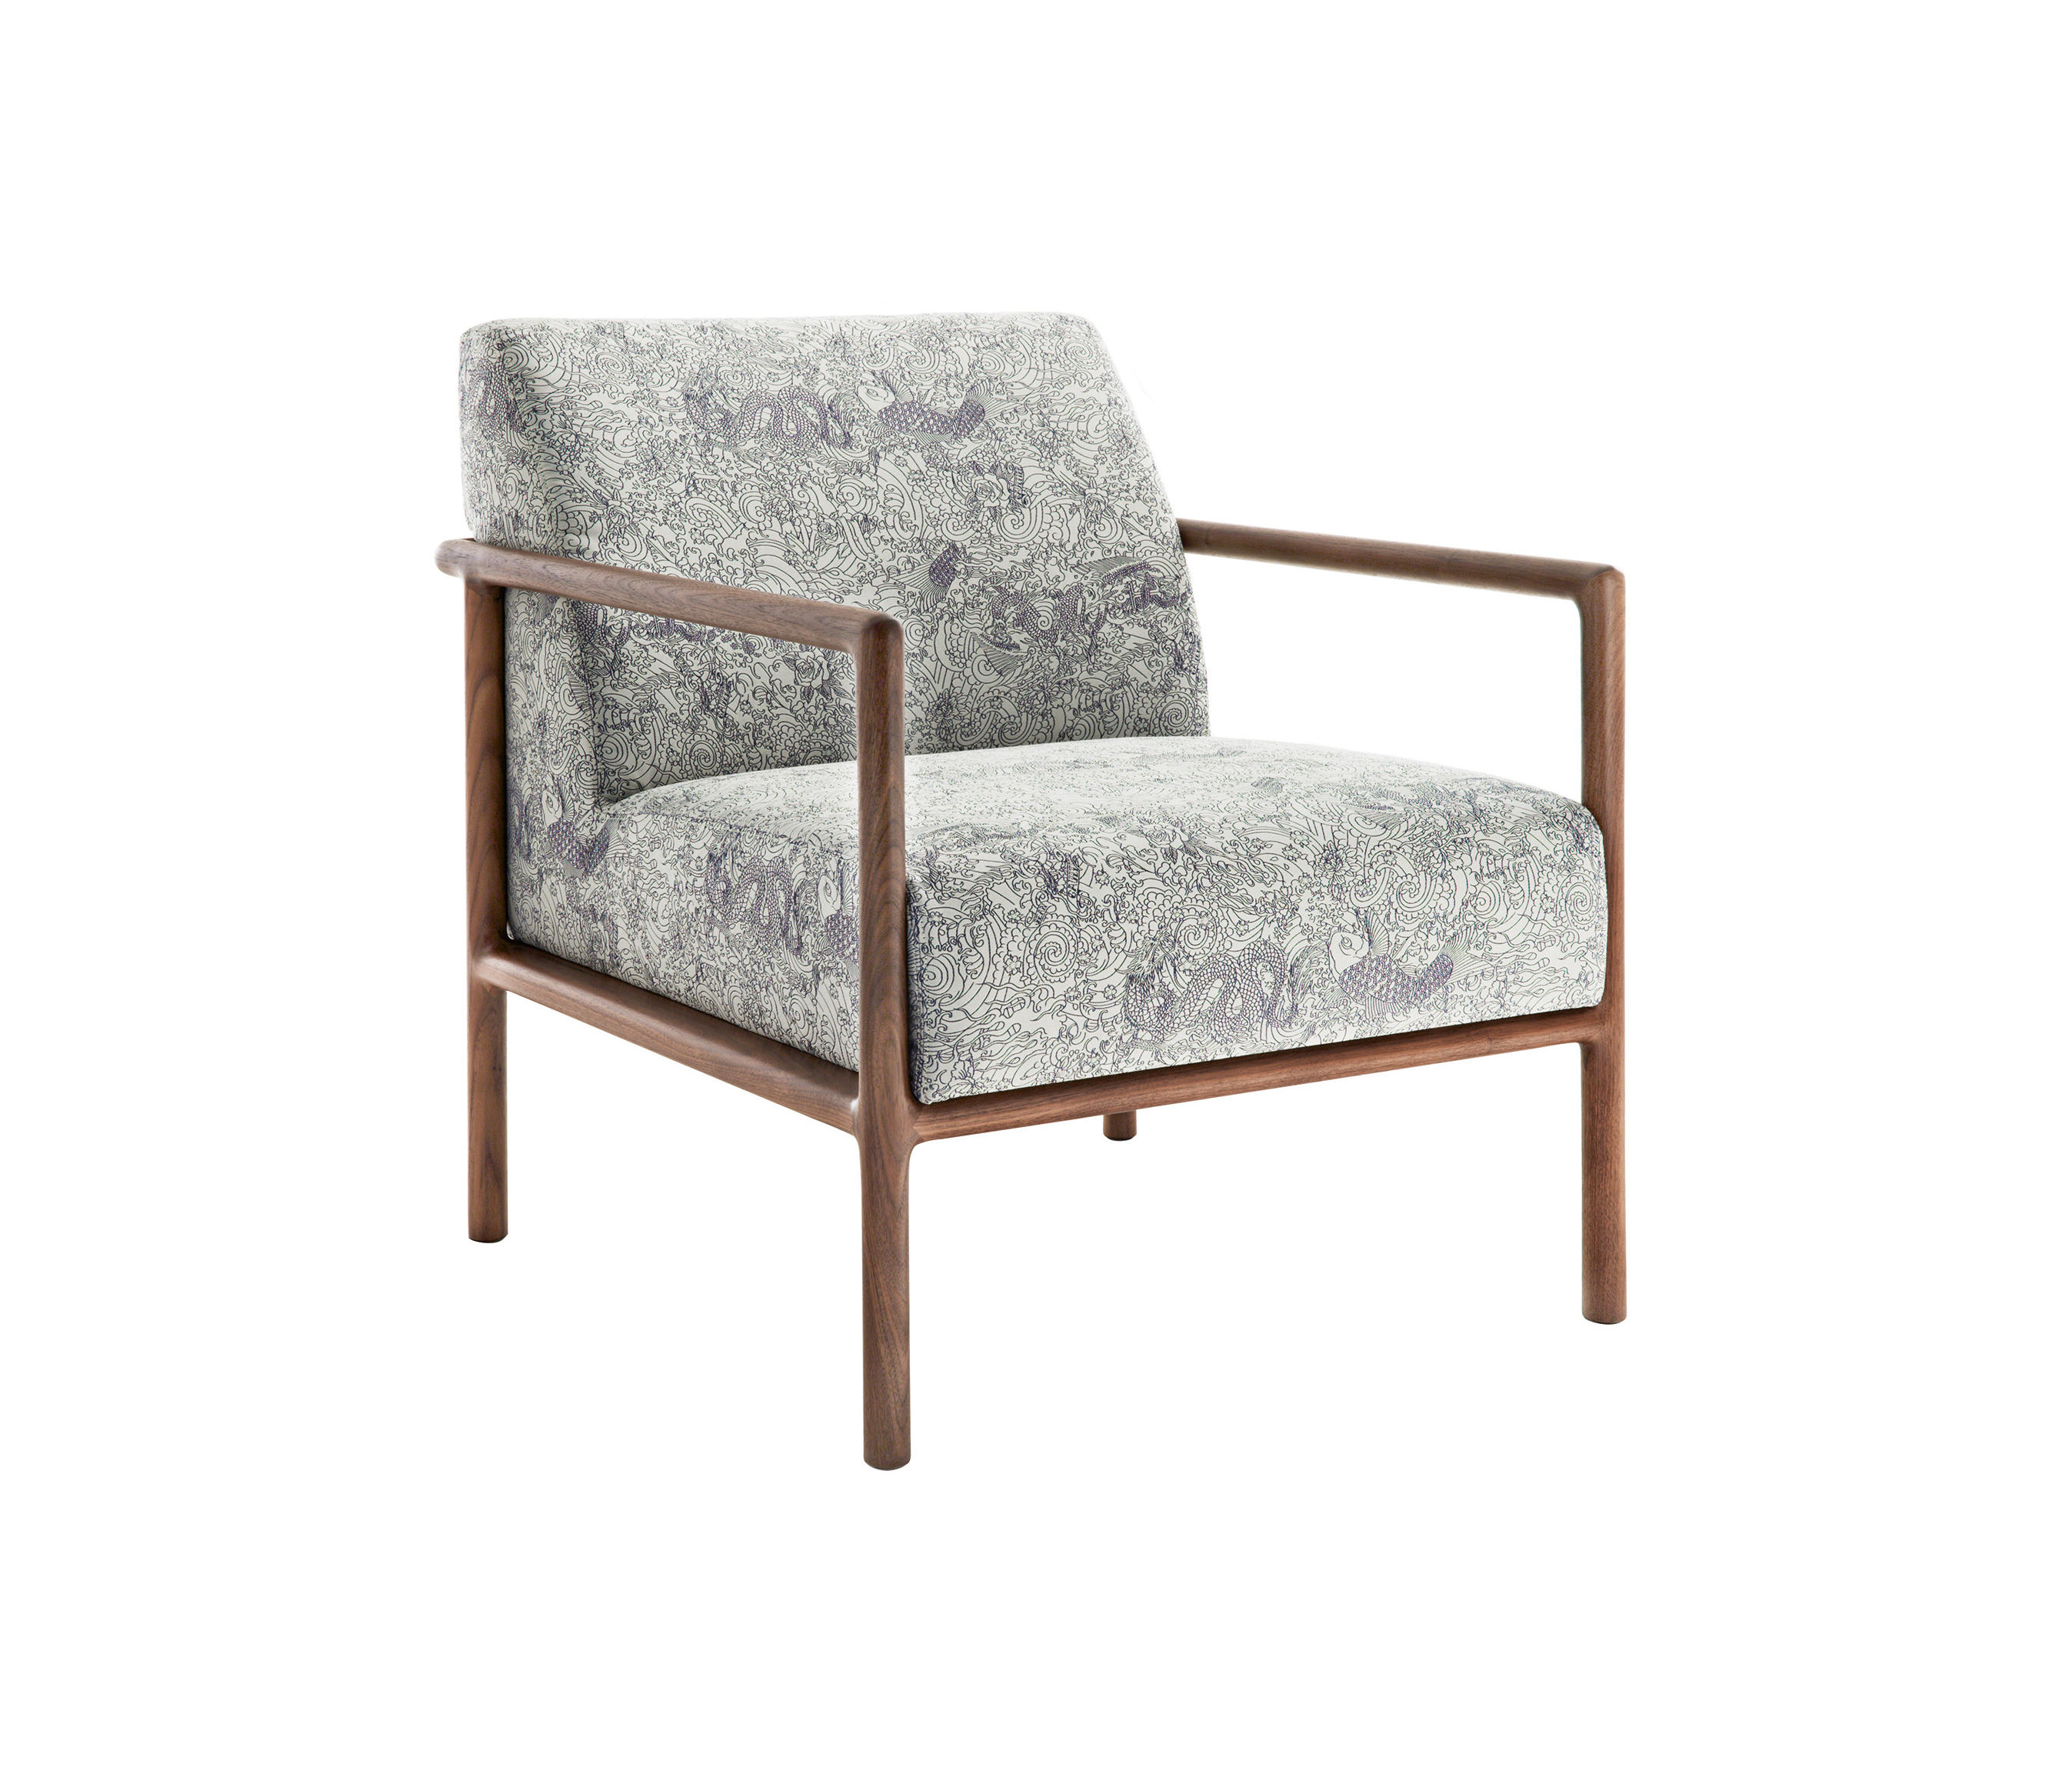 Superior Palm Beach | Armchair By HC28 | Lounge Chairs